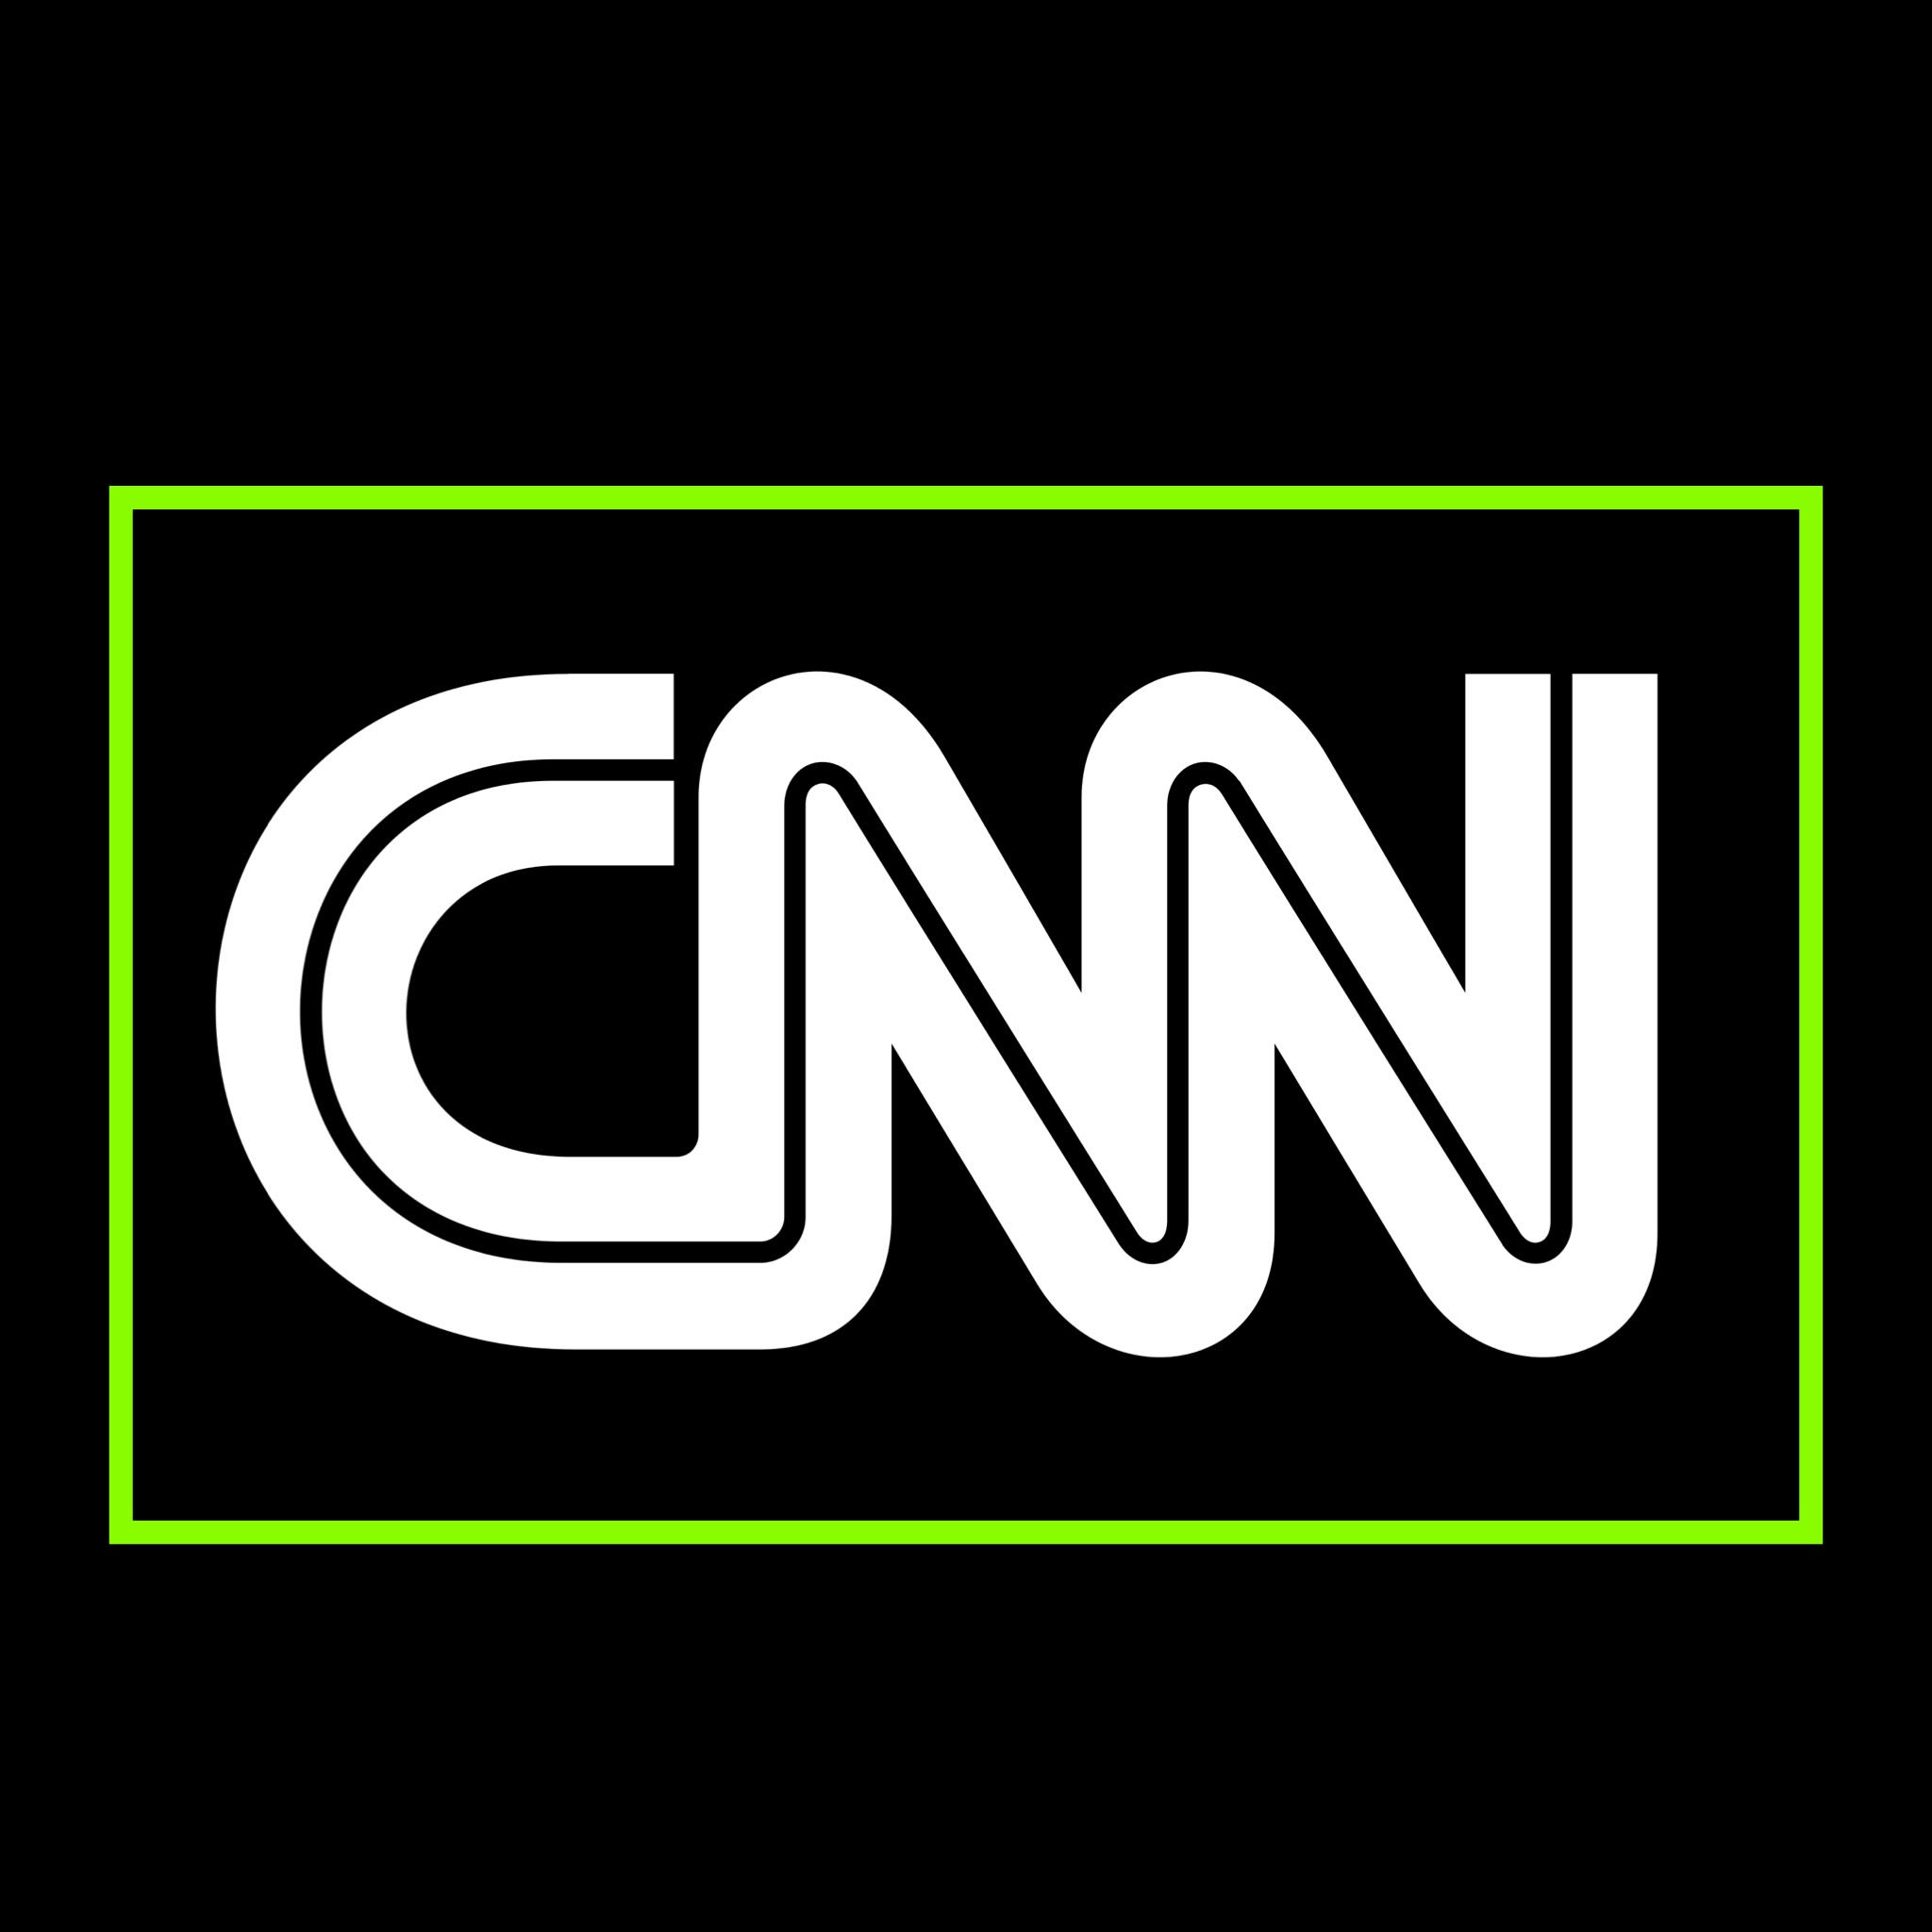 cnn graphic.jpg